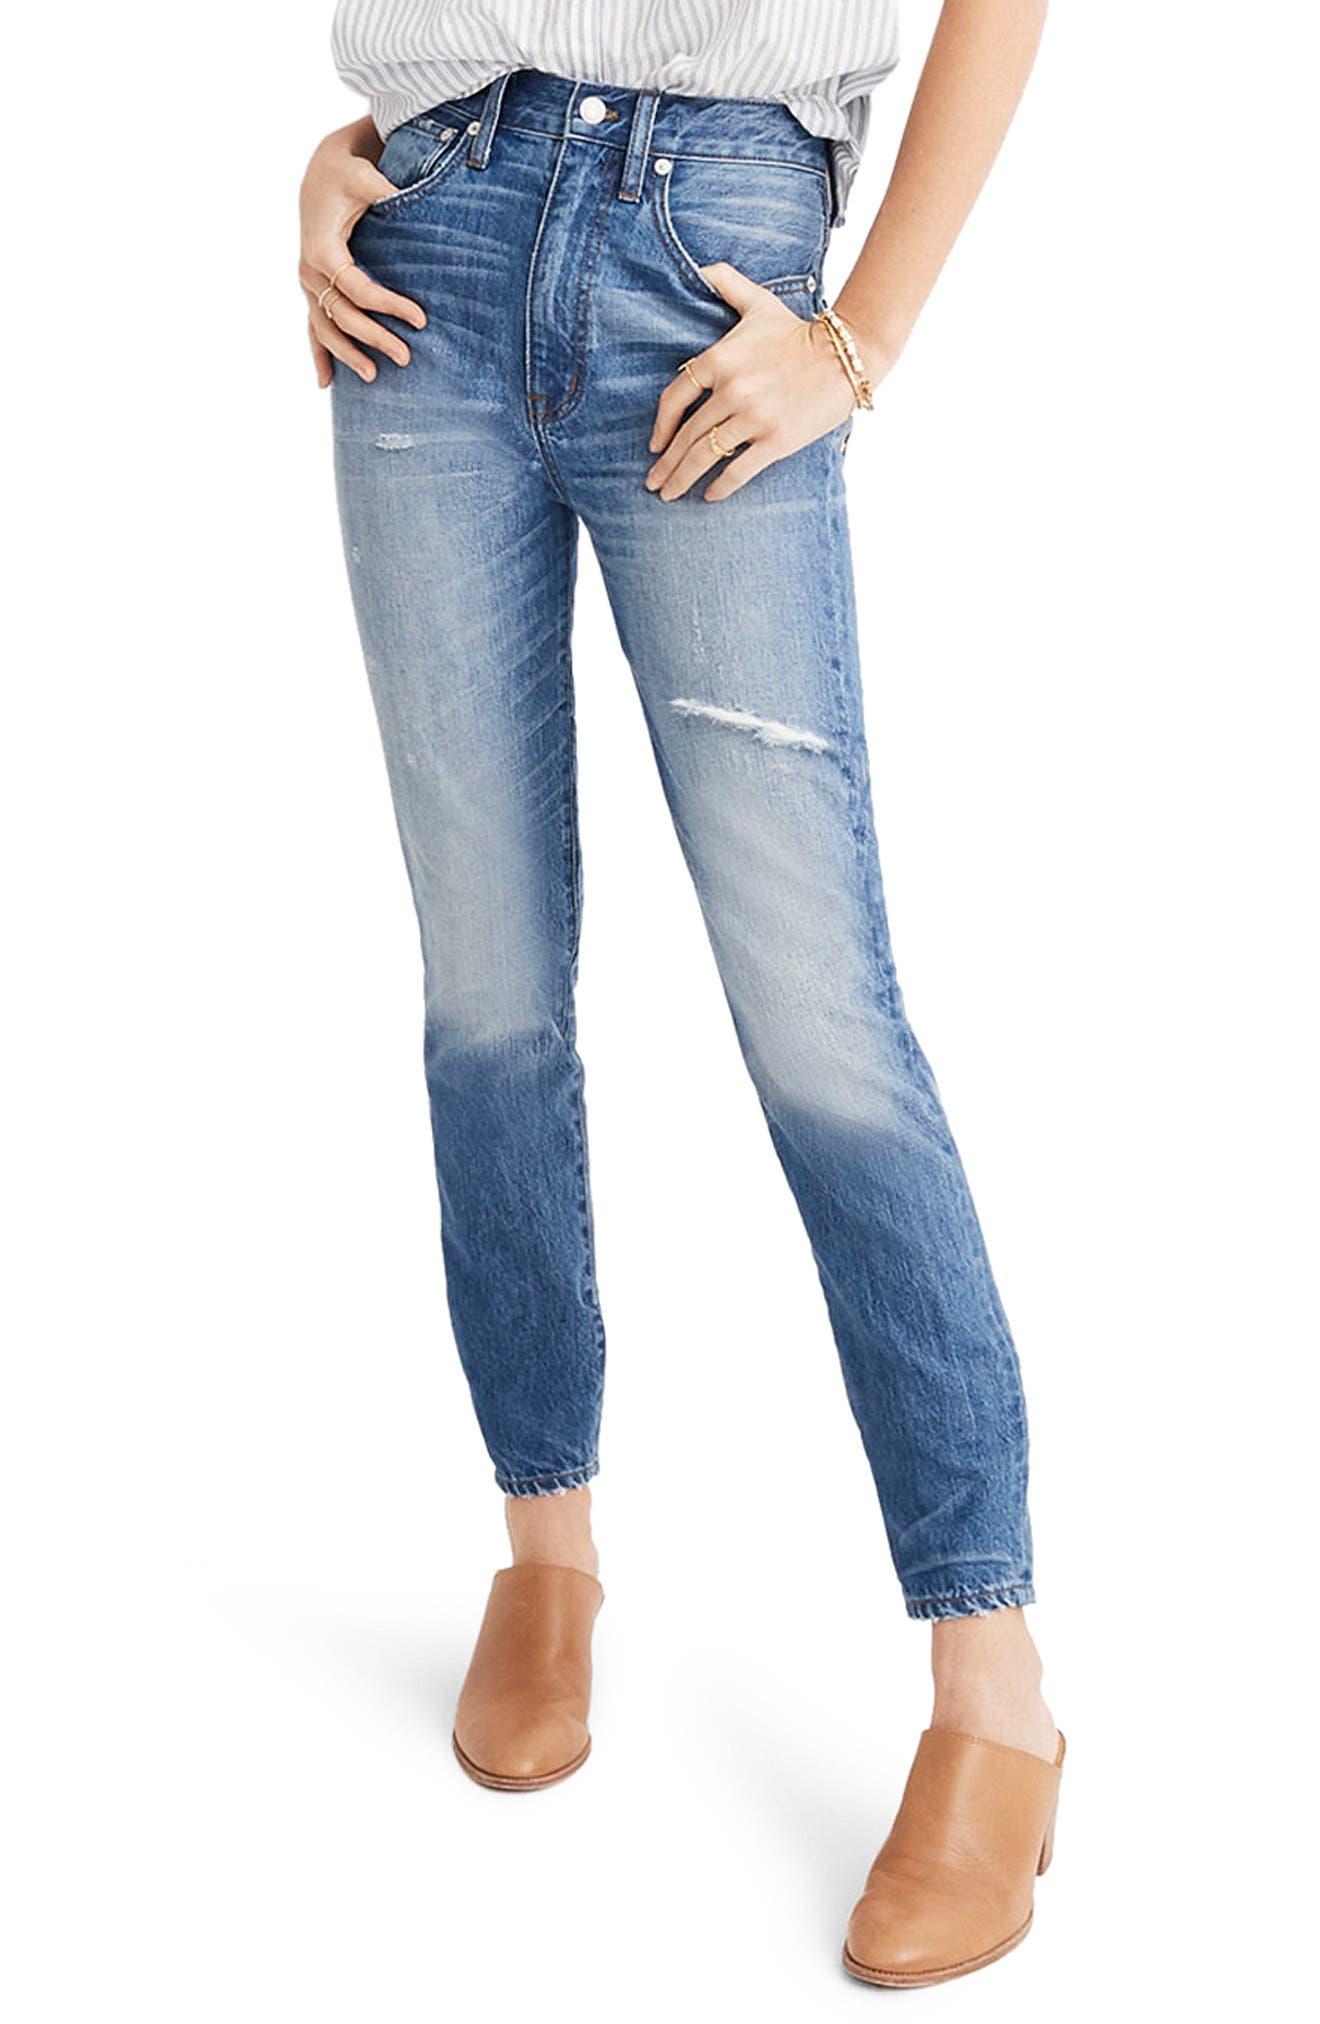 MADEWELL Rigid High Waist Skinny Jeans, Main, color, NAPA